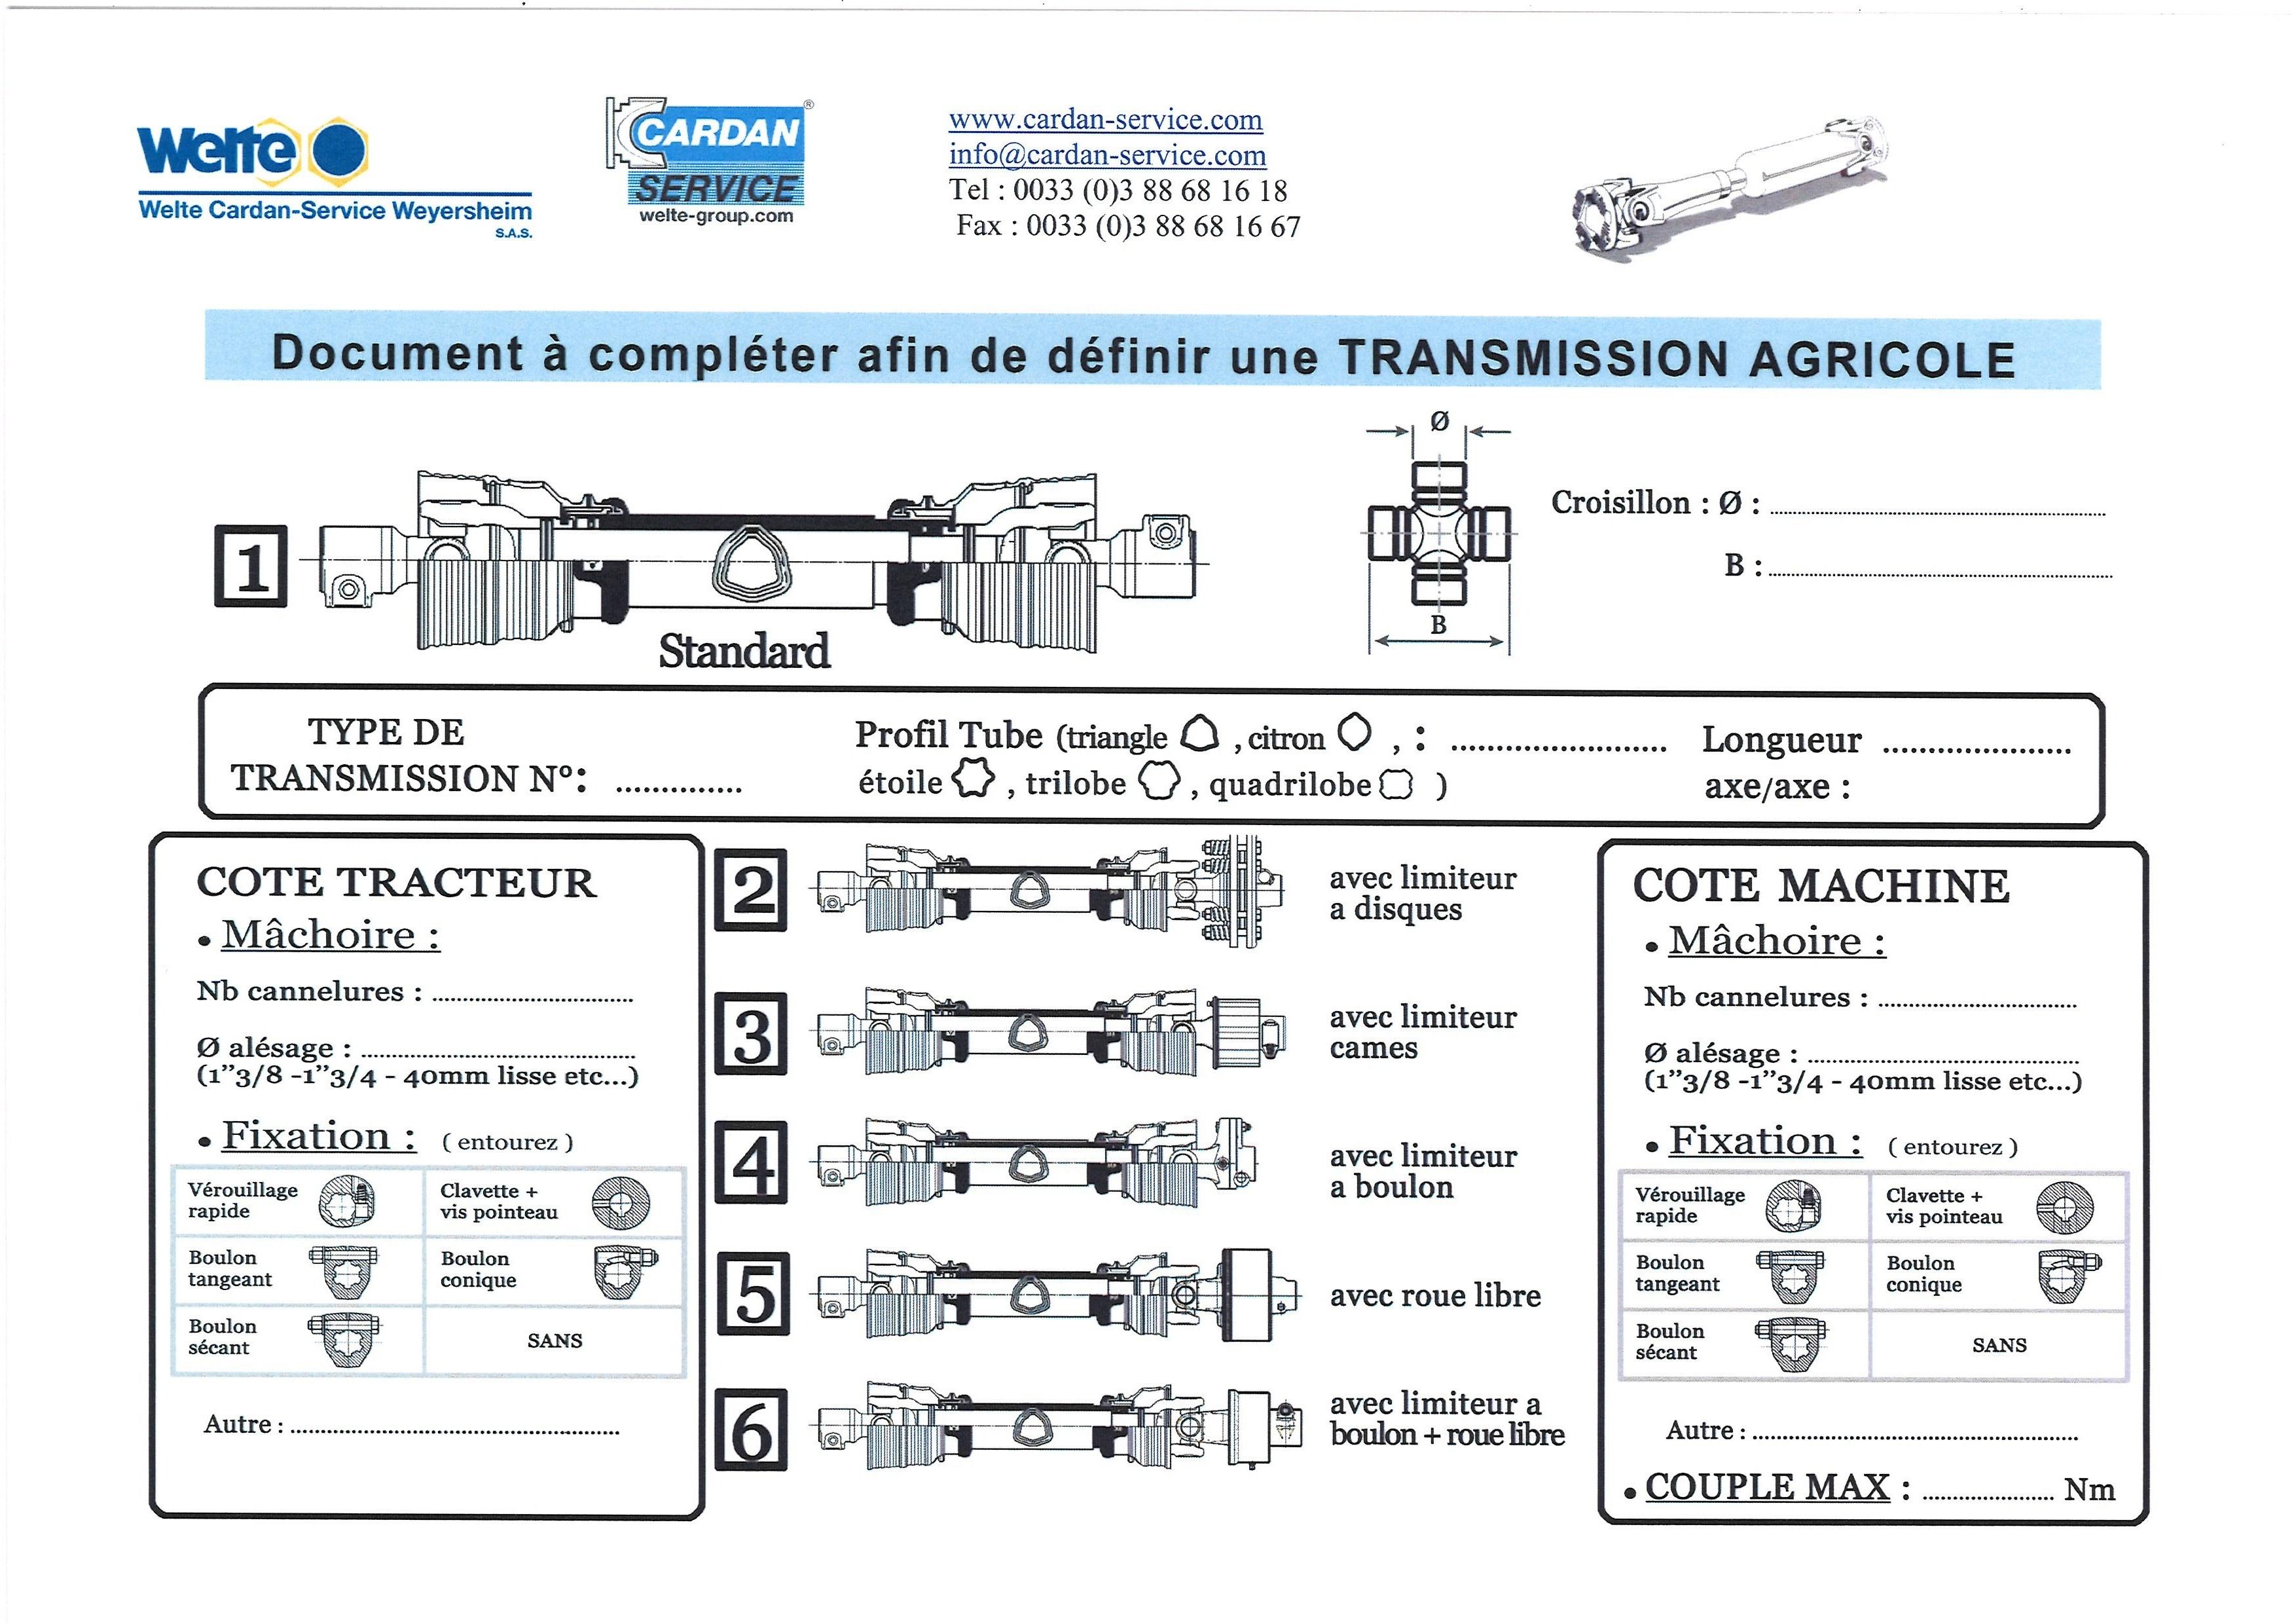 definitons_transmission_agricole_ax_tx_bx_ye